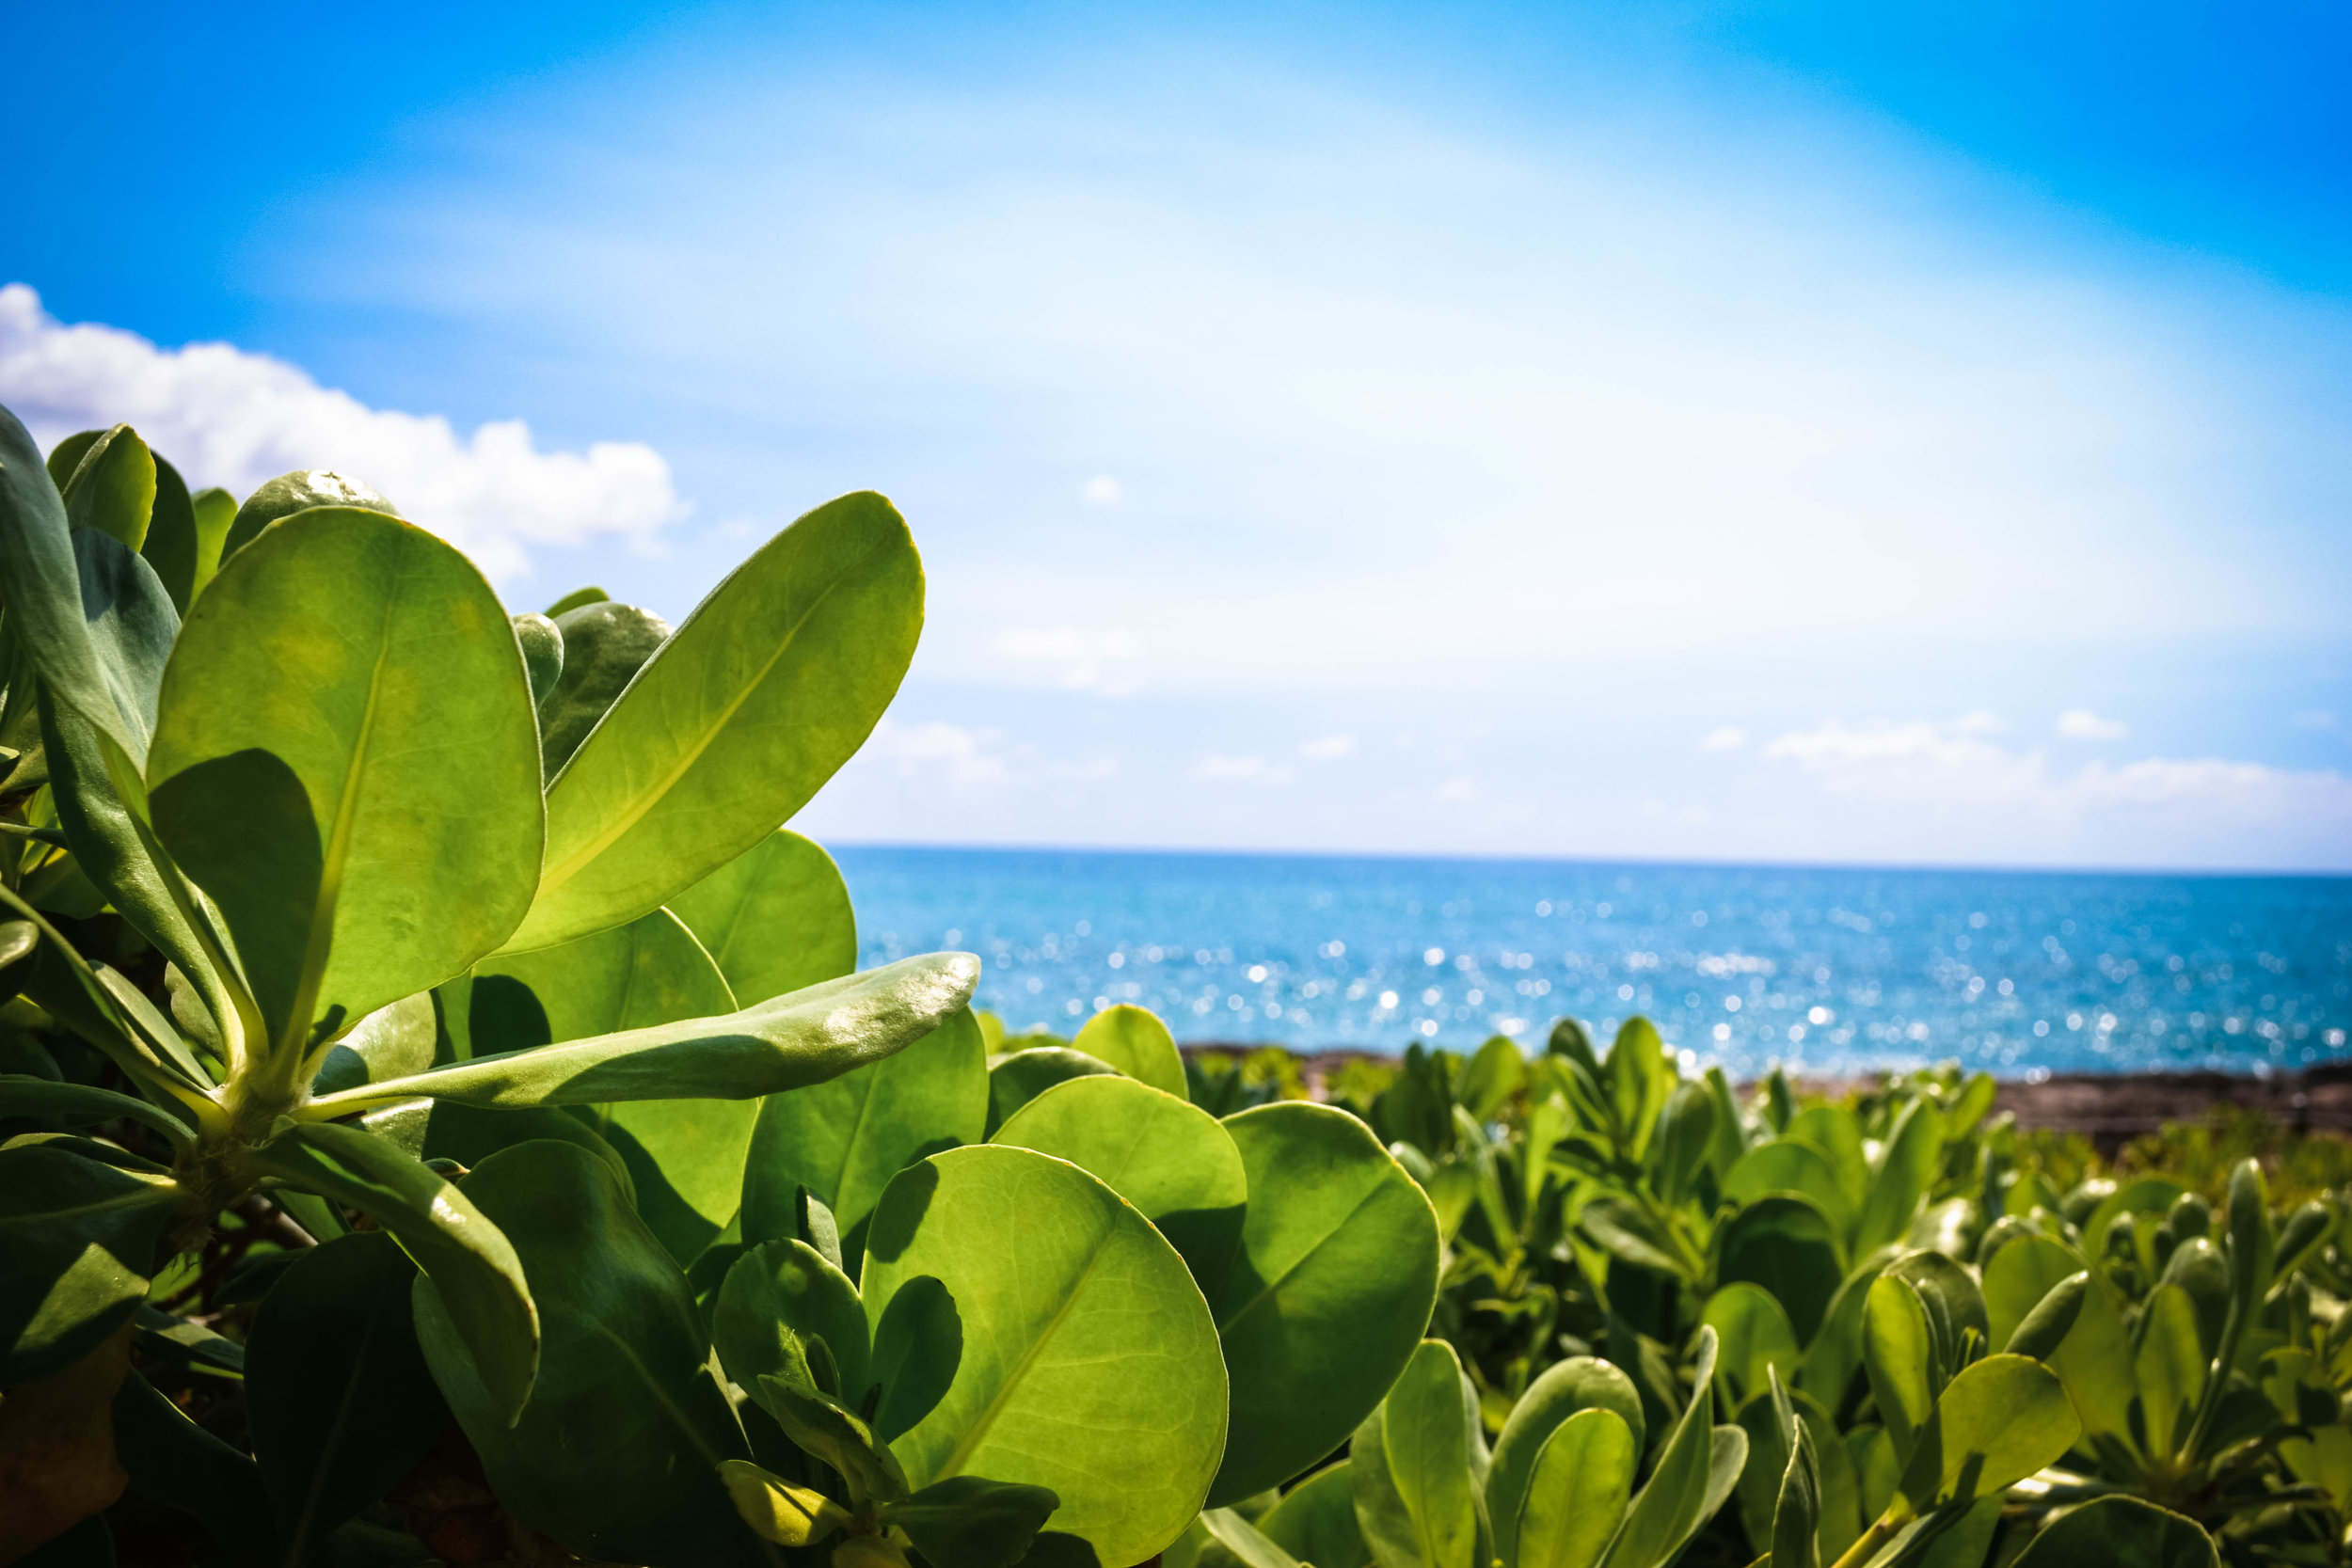 sea view.  honolulu. hawaii. usa.